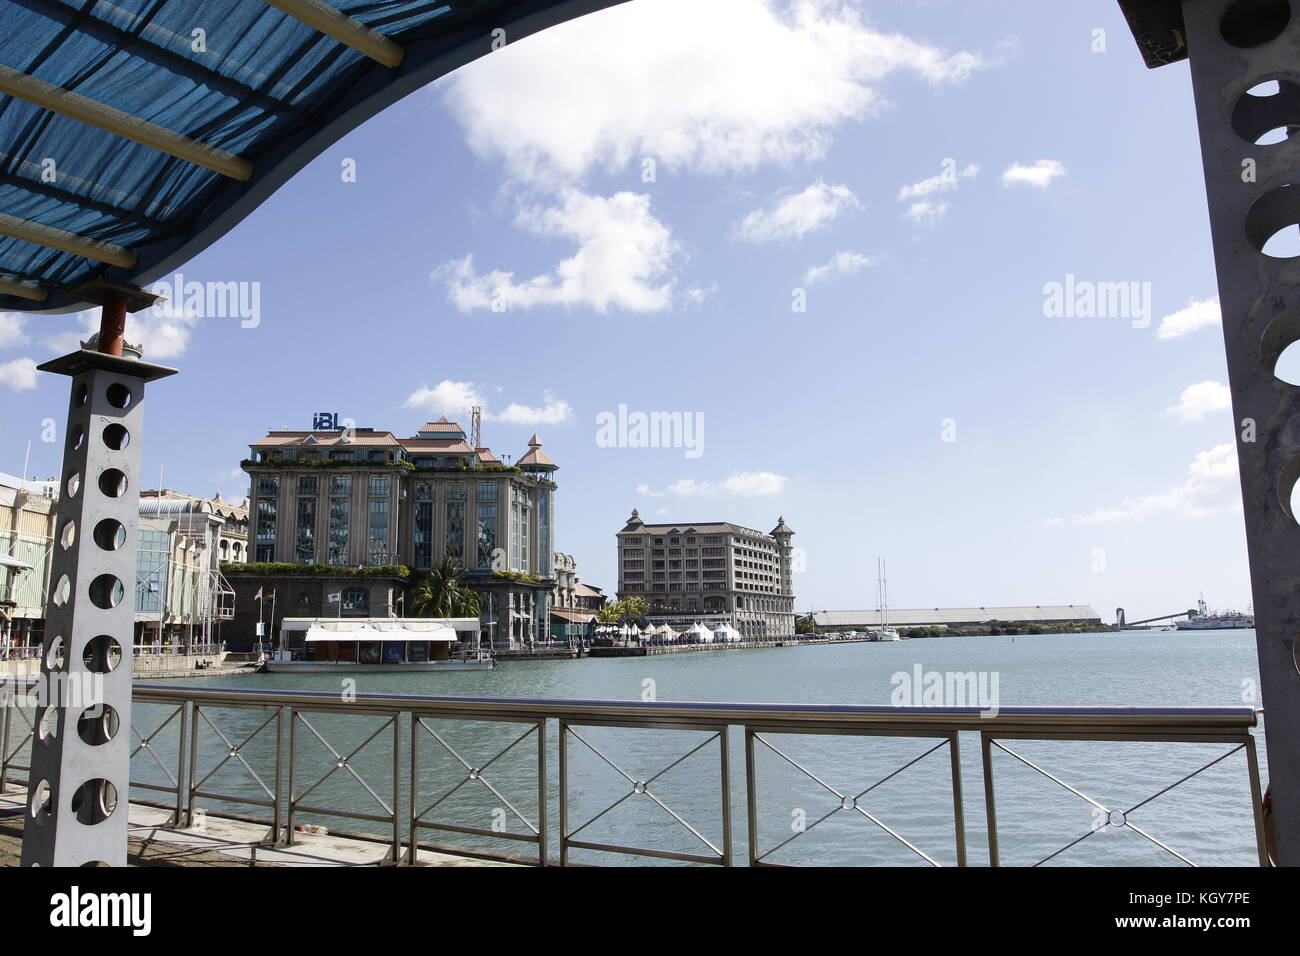 Mauritius port louis district stock photos mauritius - Where is port louis mauritius located ...